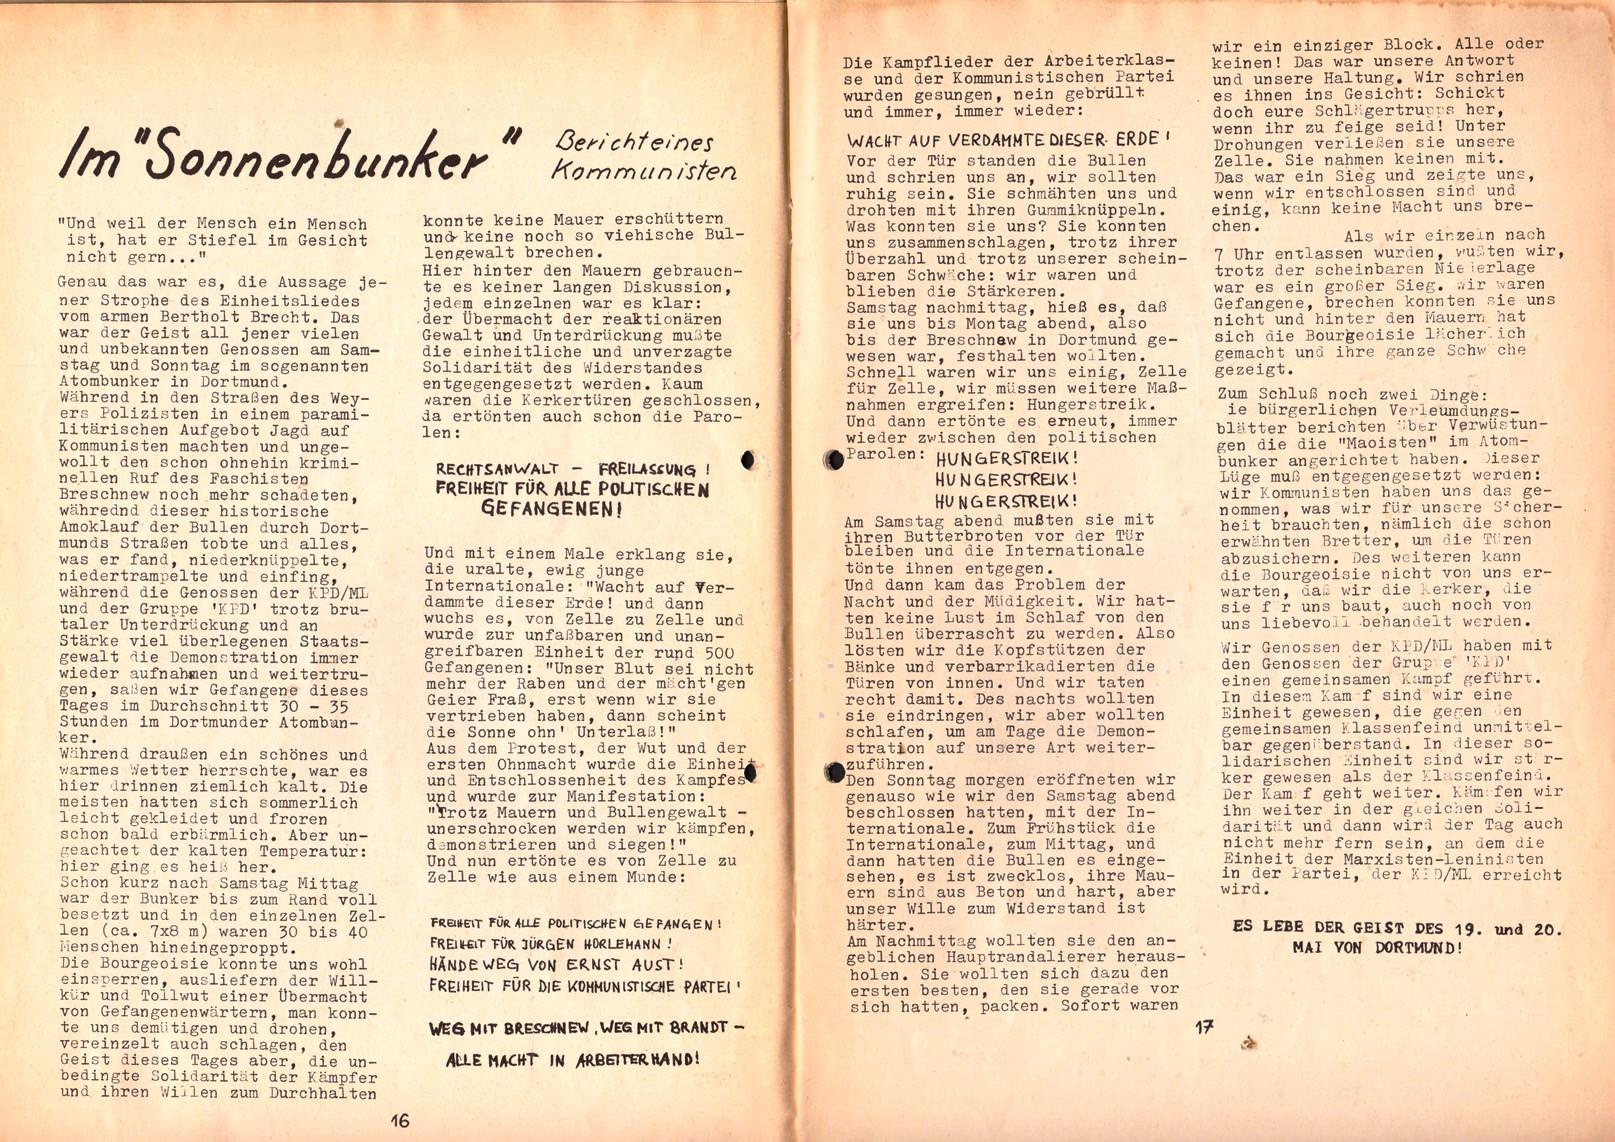 KPDML_1973_Breschnew_Besuch_in_Bonn_09